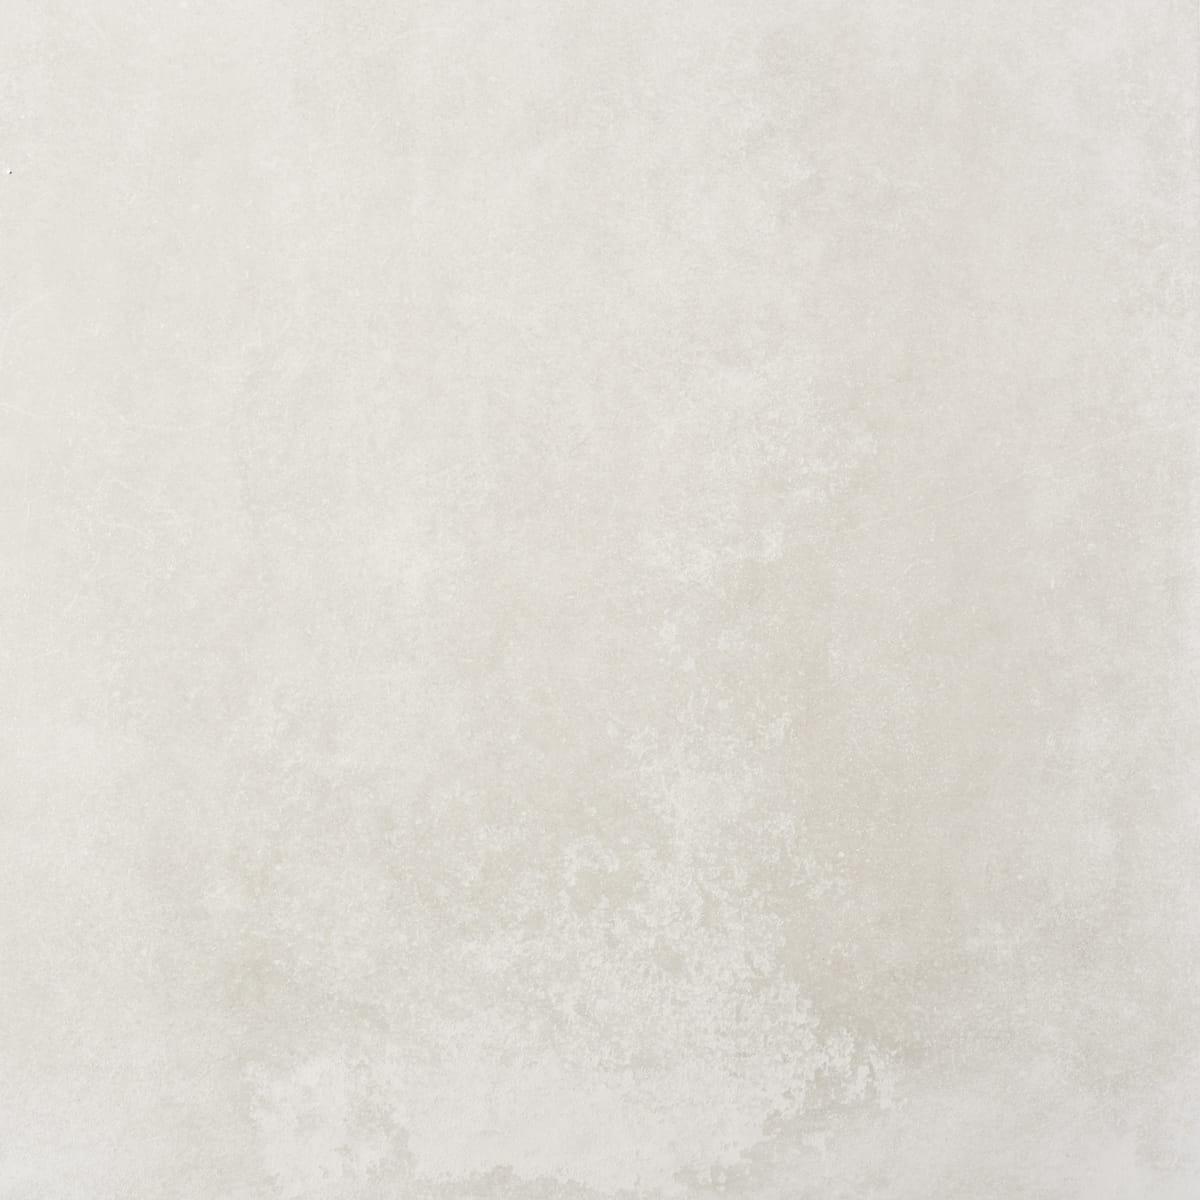 FOTO queens white ant 75x75 1